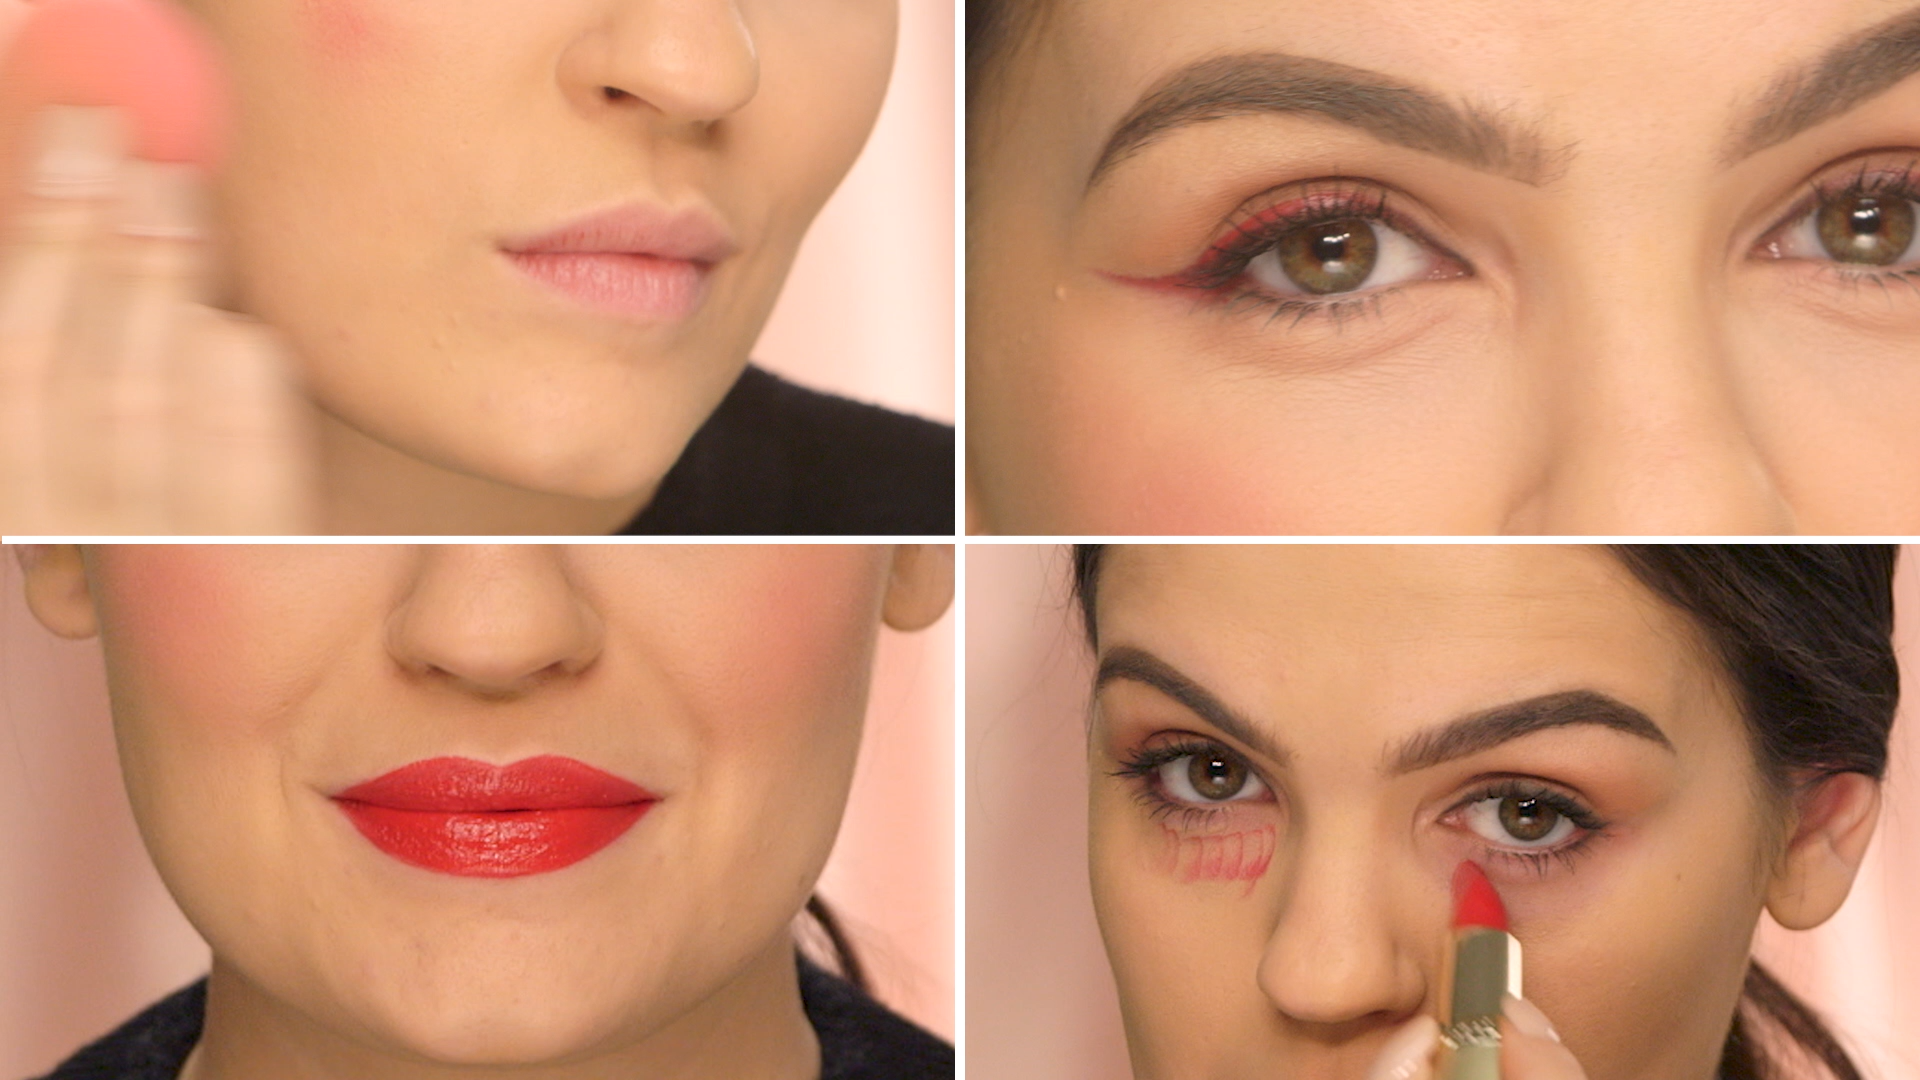 4 Red Lipstick Makeup Hacks -   16 makeup Hacks for lips ideas